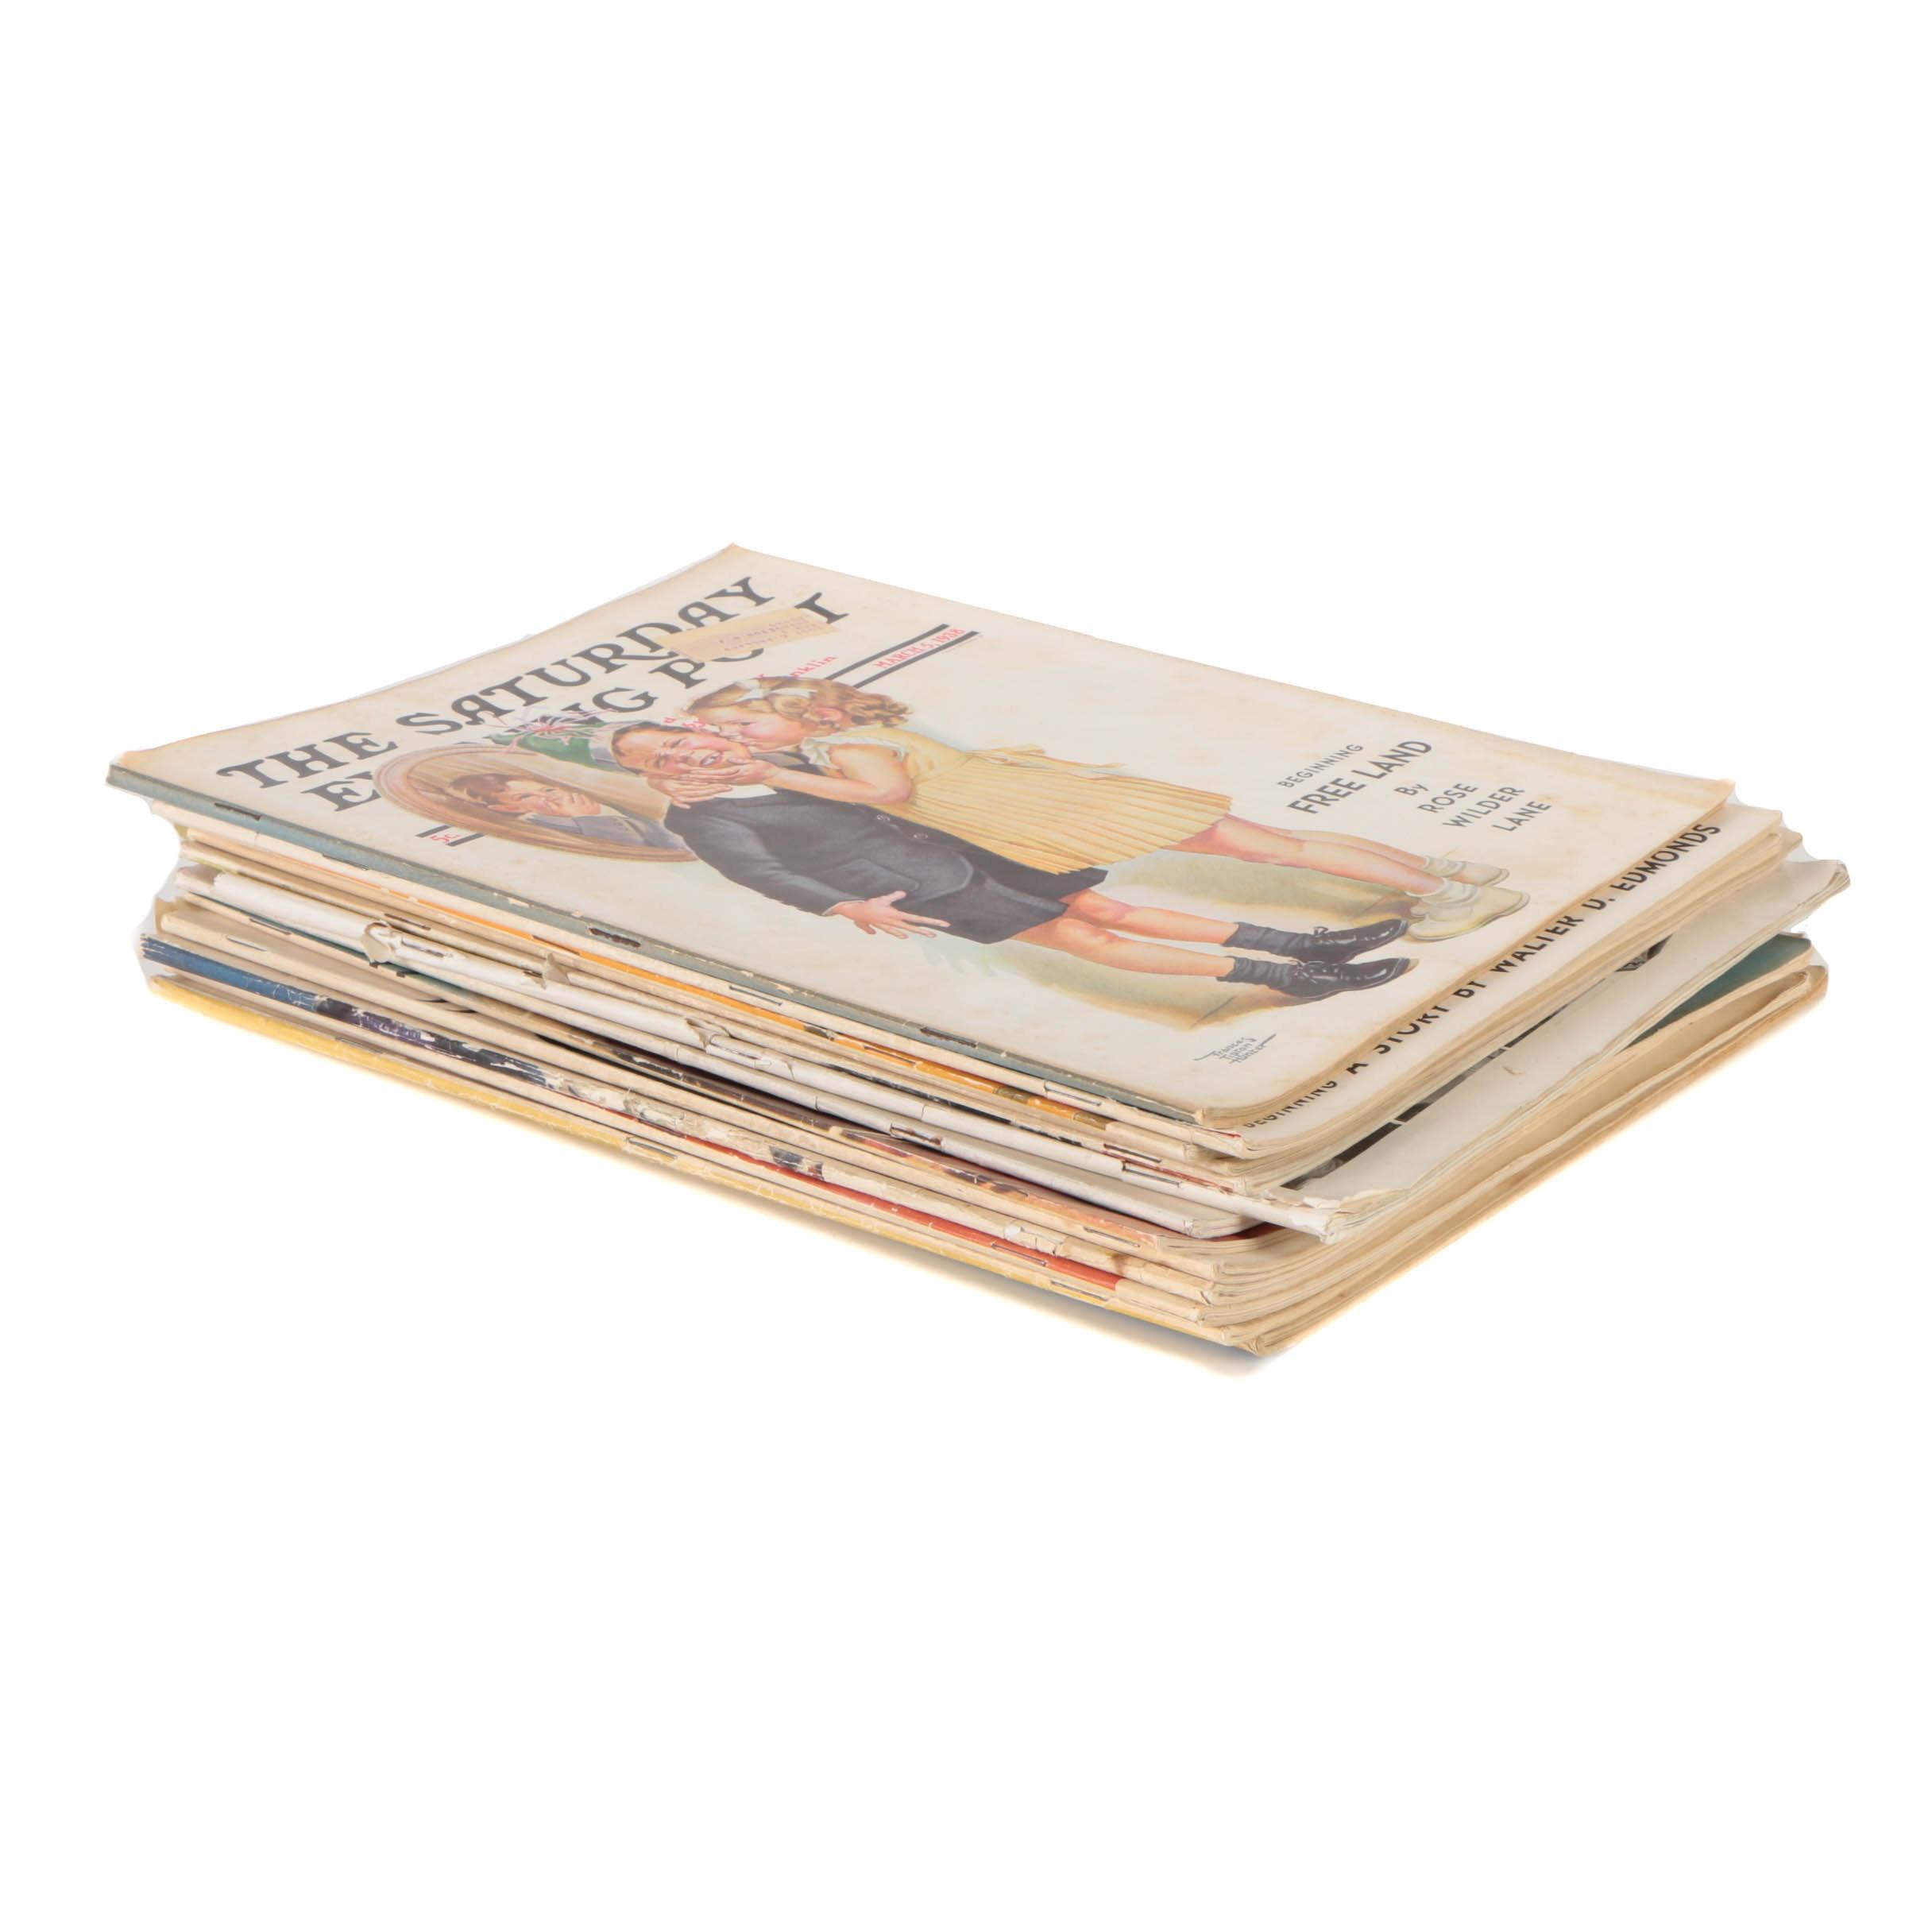 "Early to Mid Twentieth Century ""Saturday Evening Post"" Magazines"